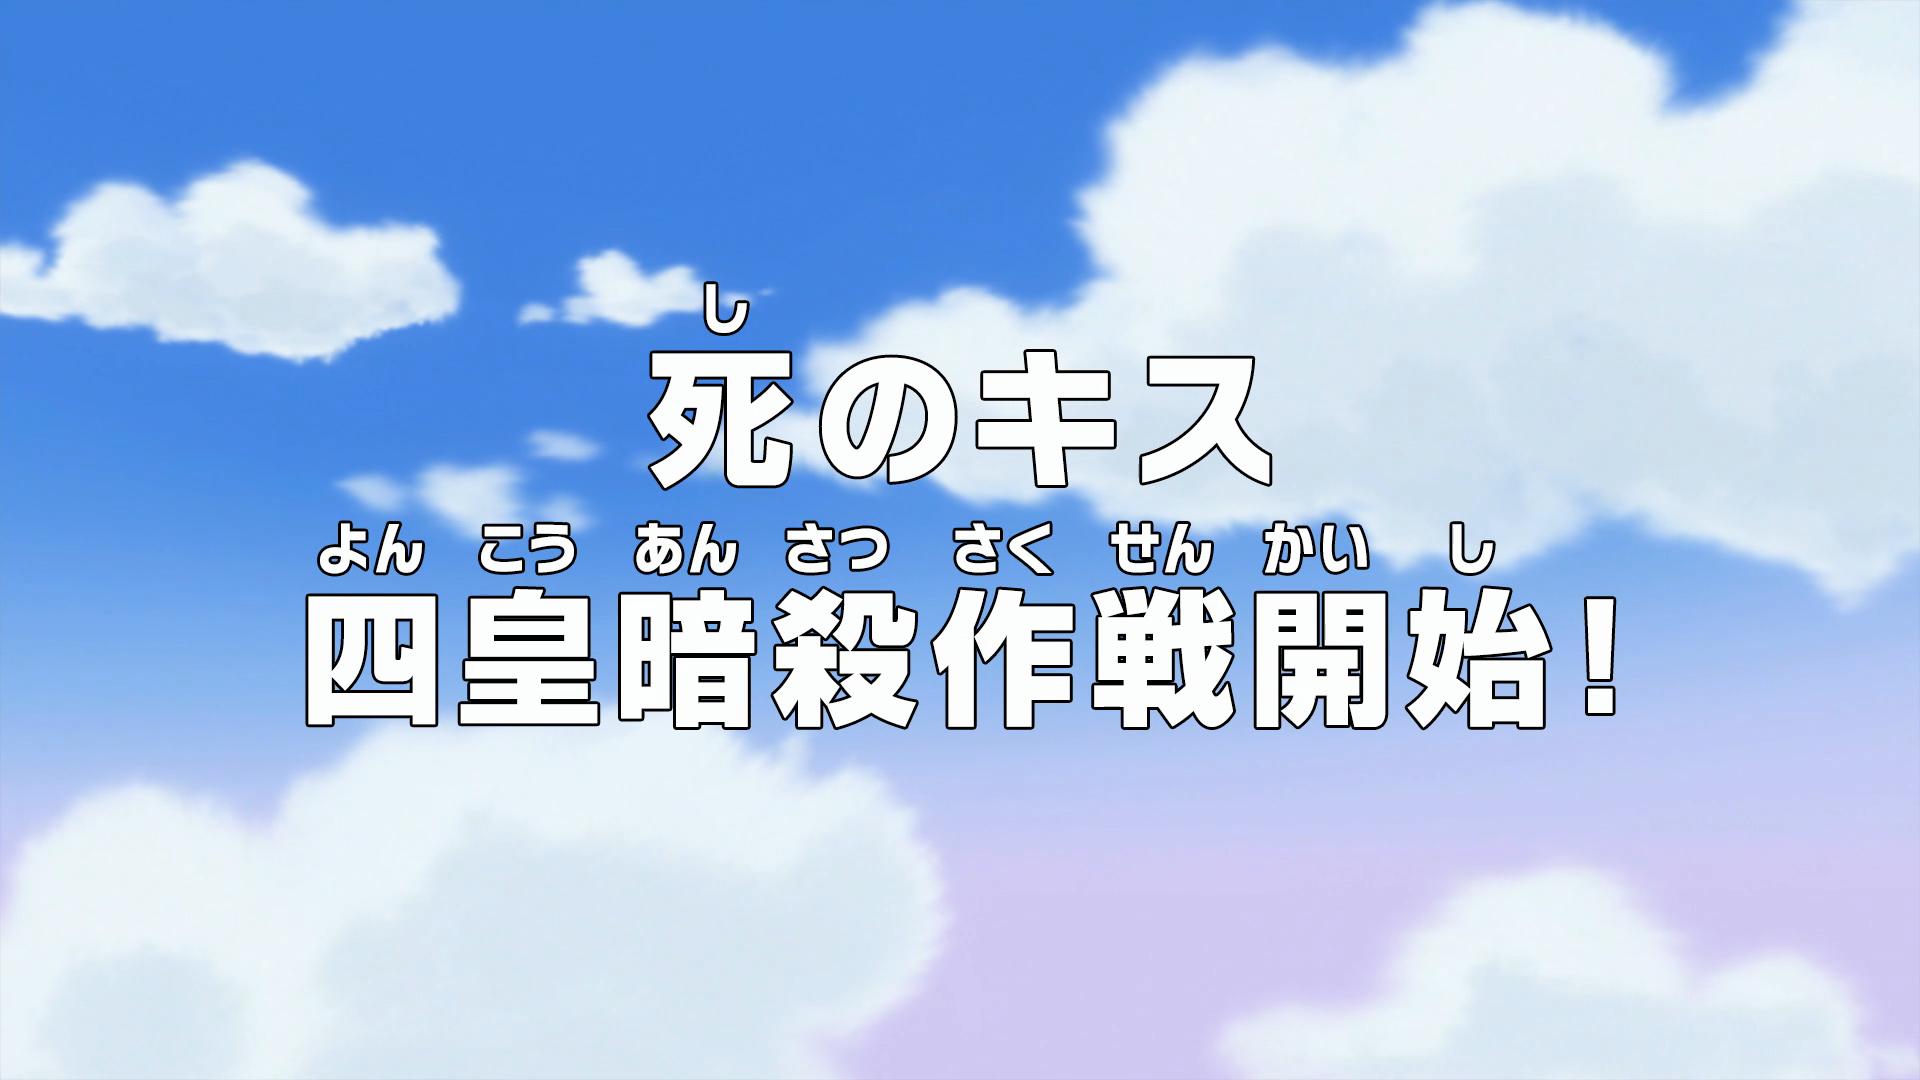 Episode 832